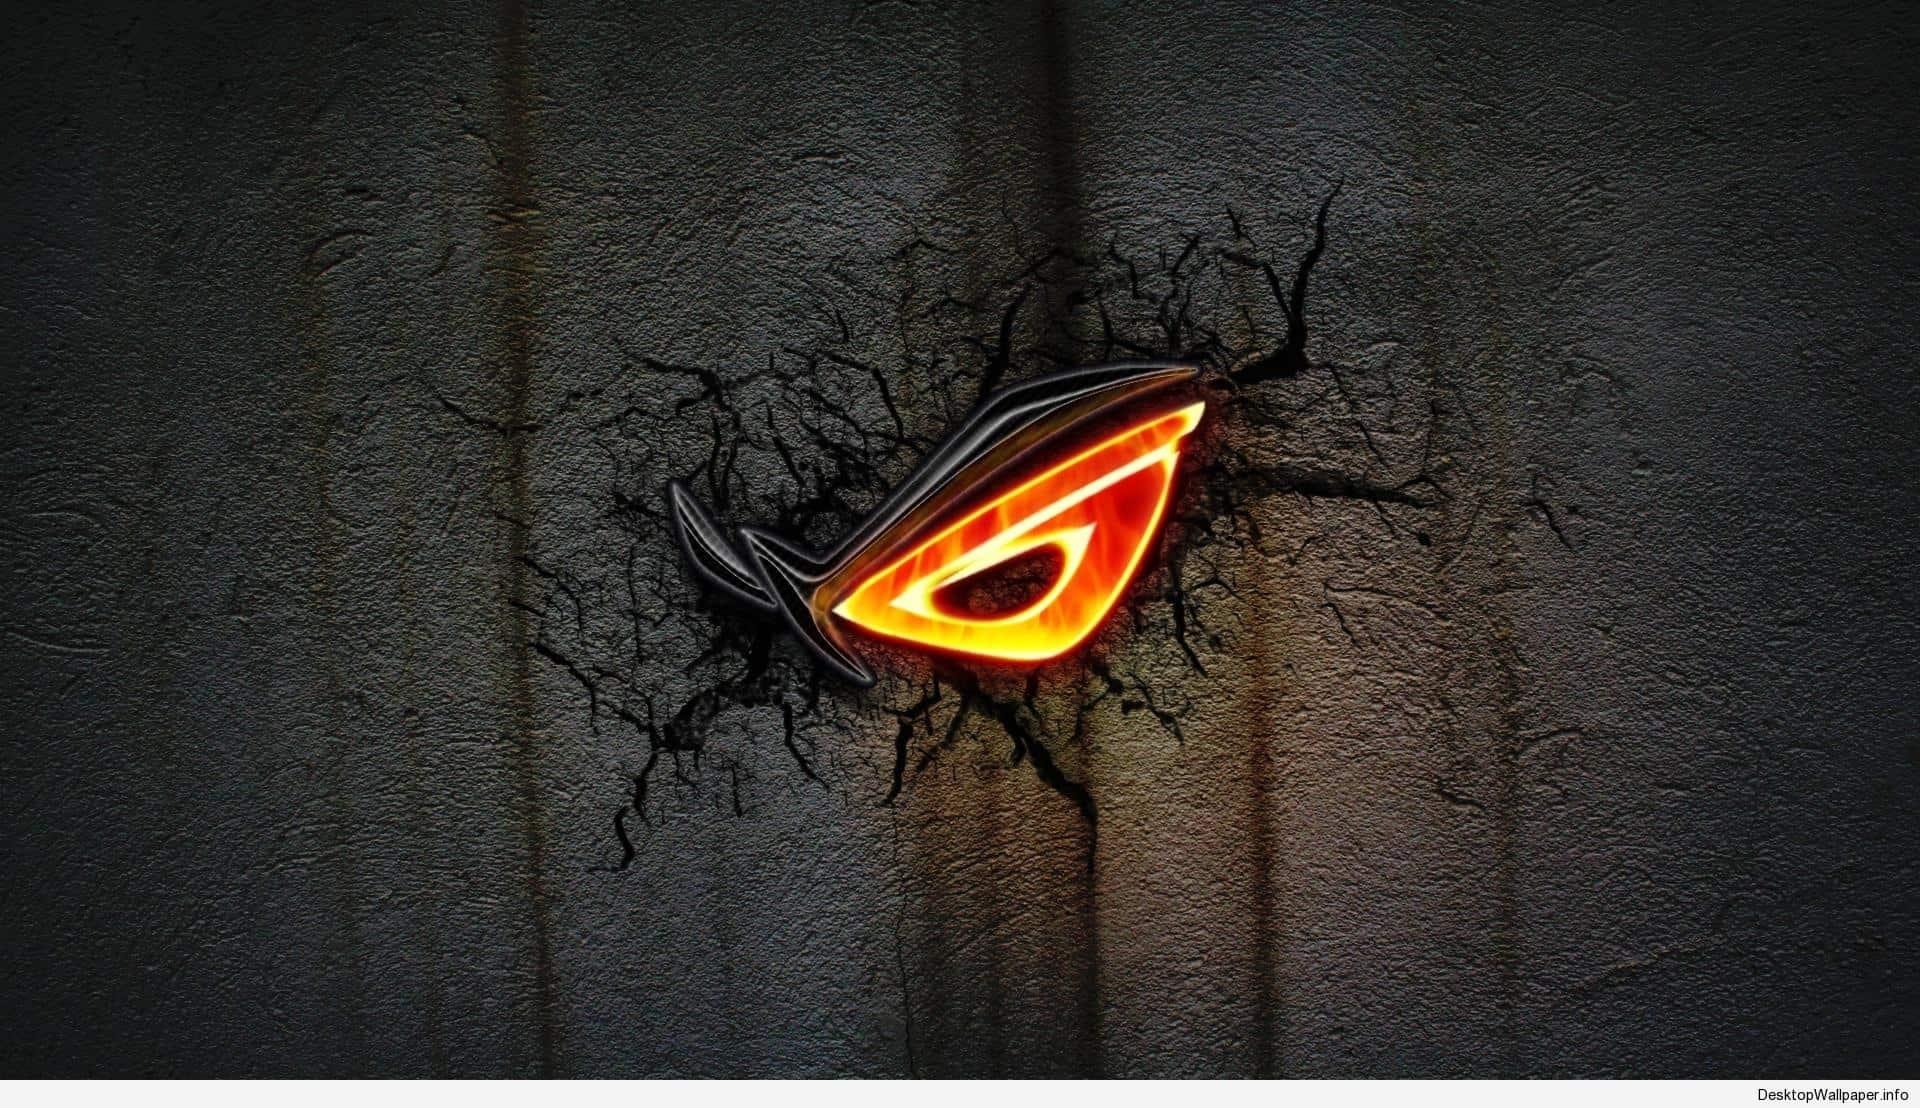 Desktop Gaming Wallpaper Posted By John Thompson